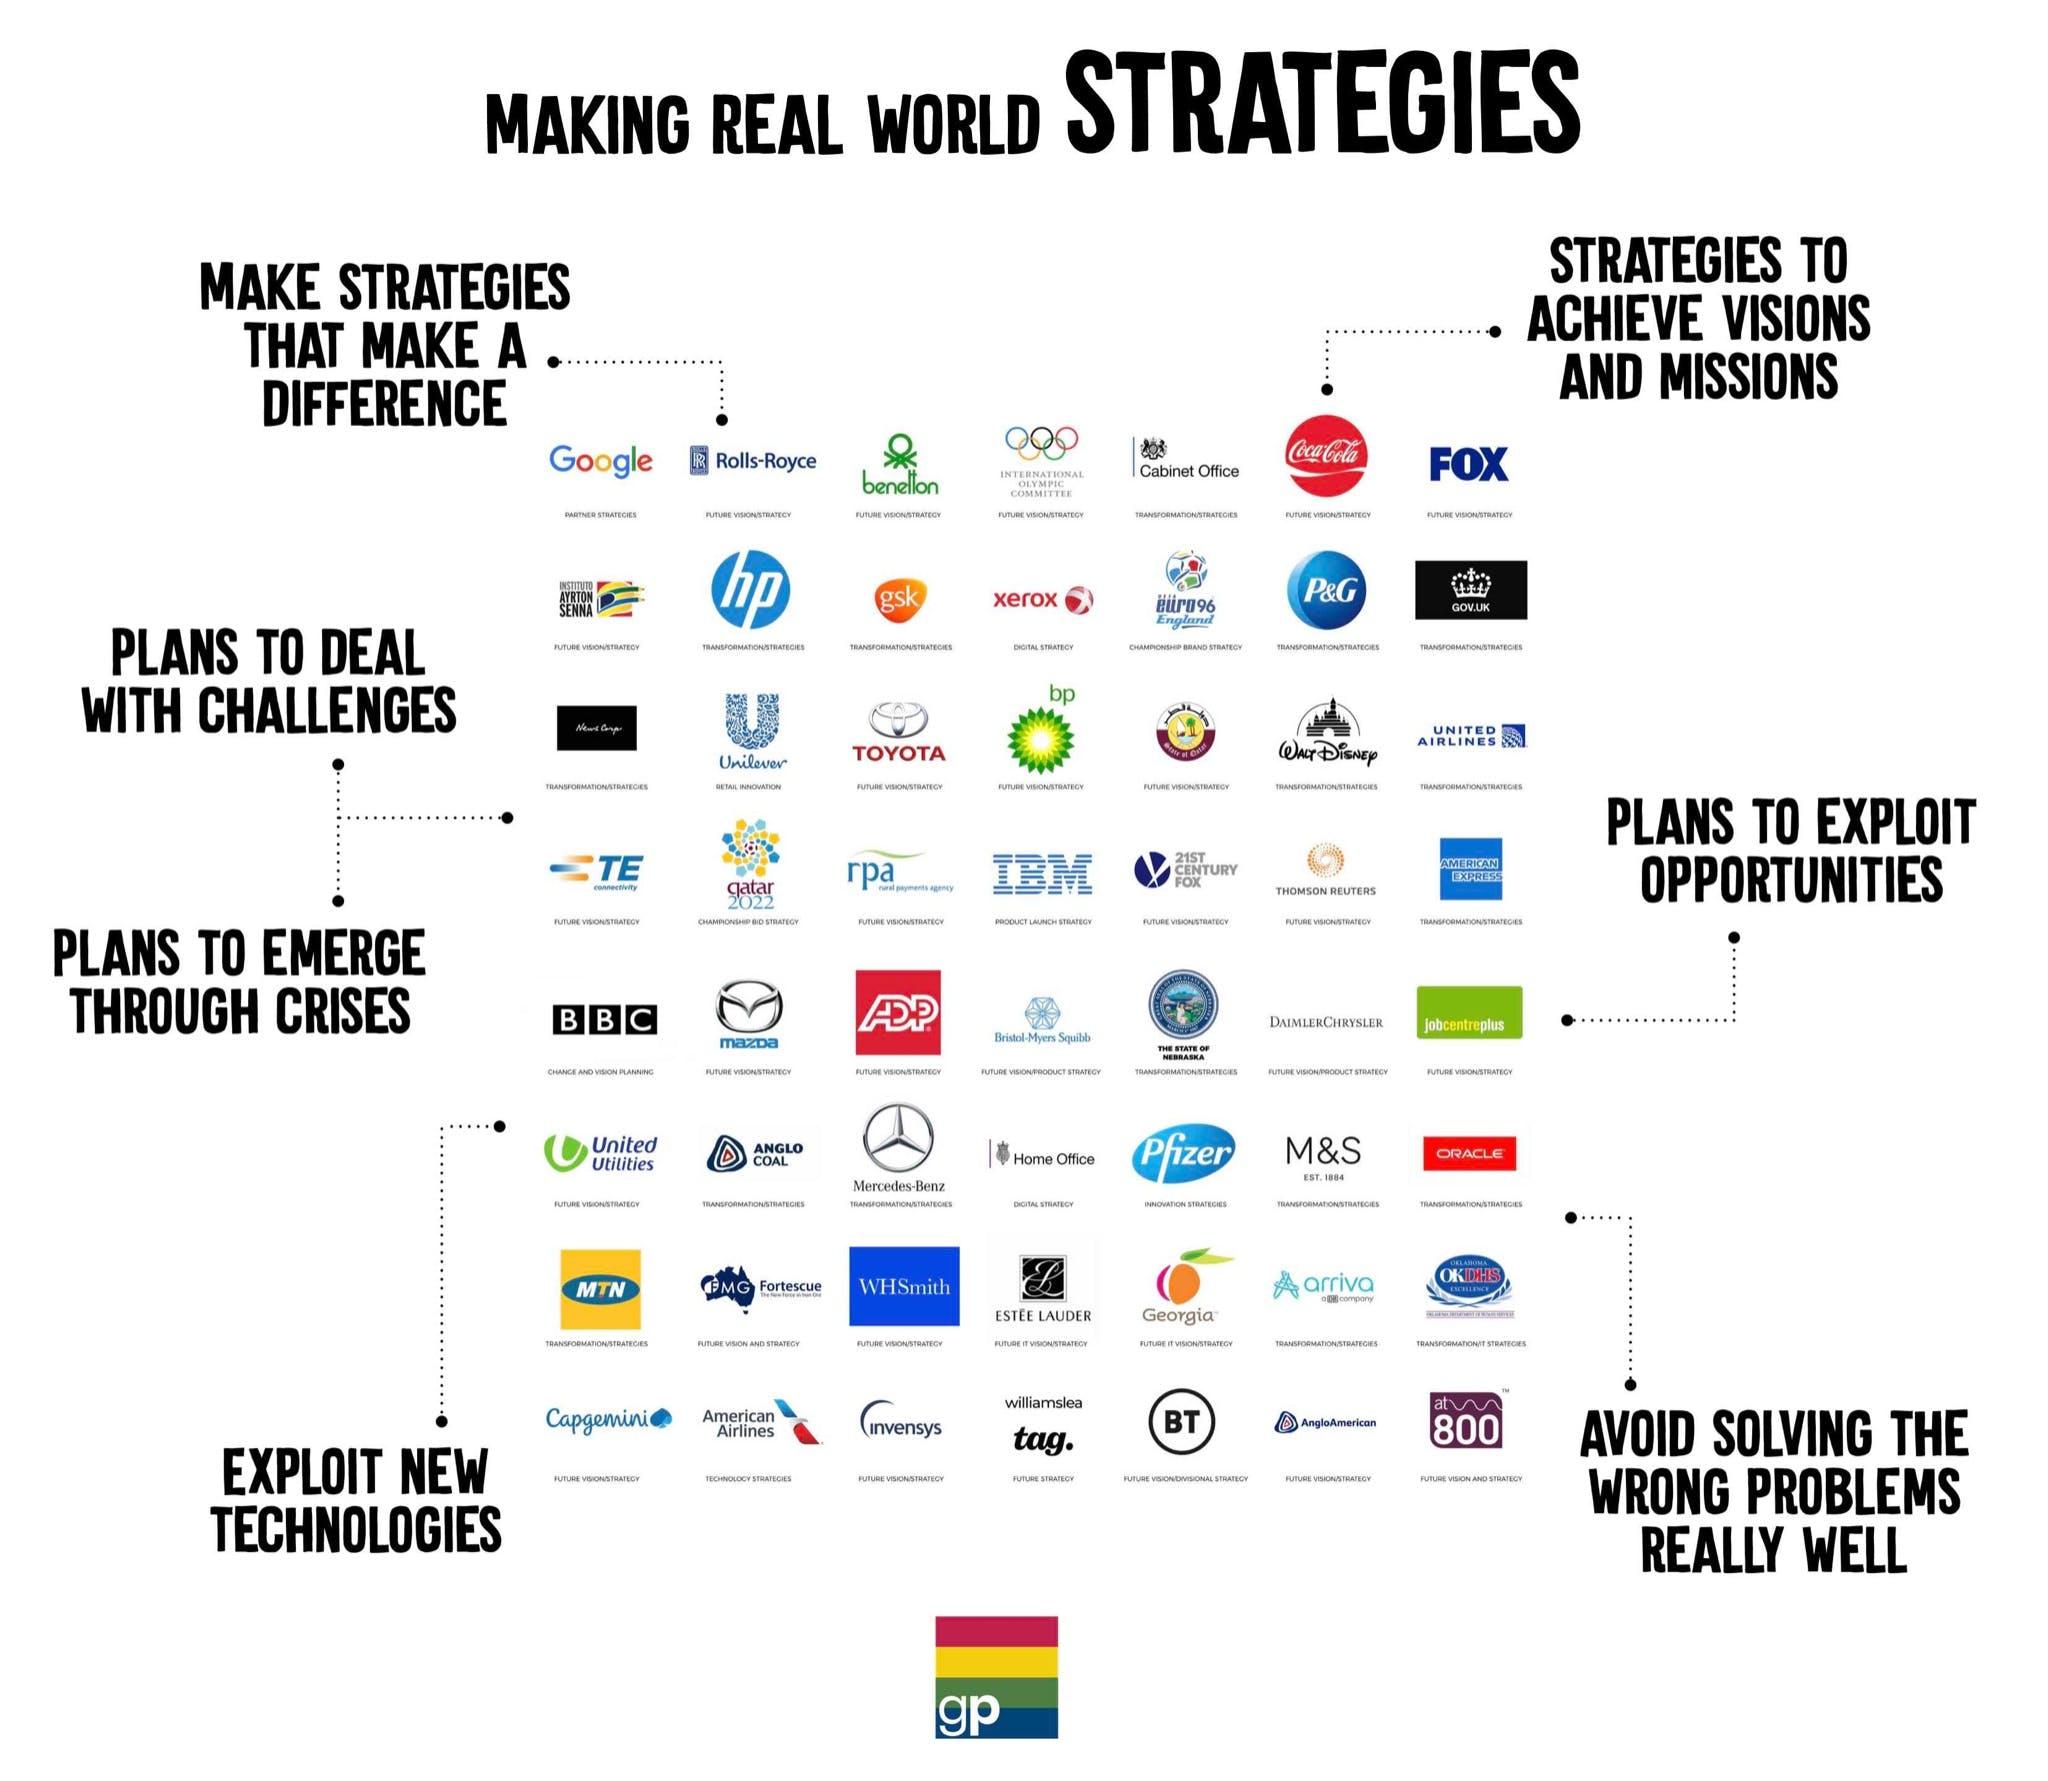 real world strategies.jpg